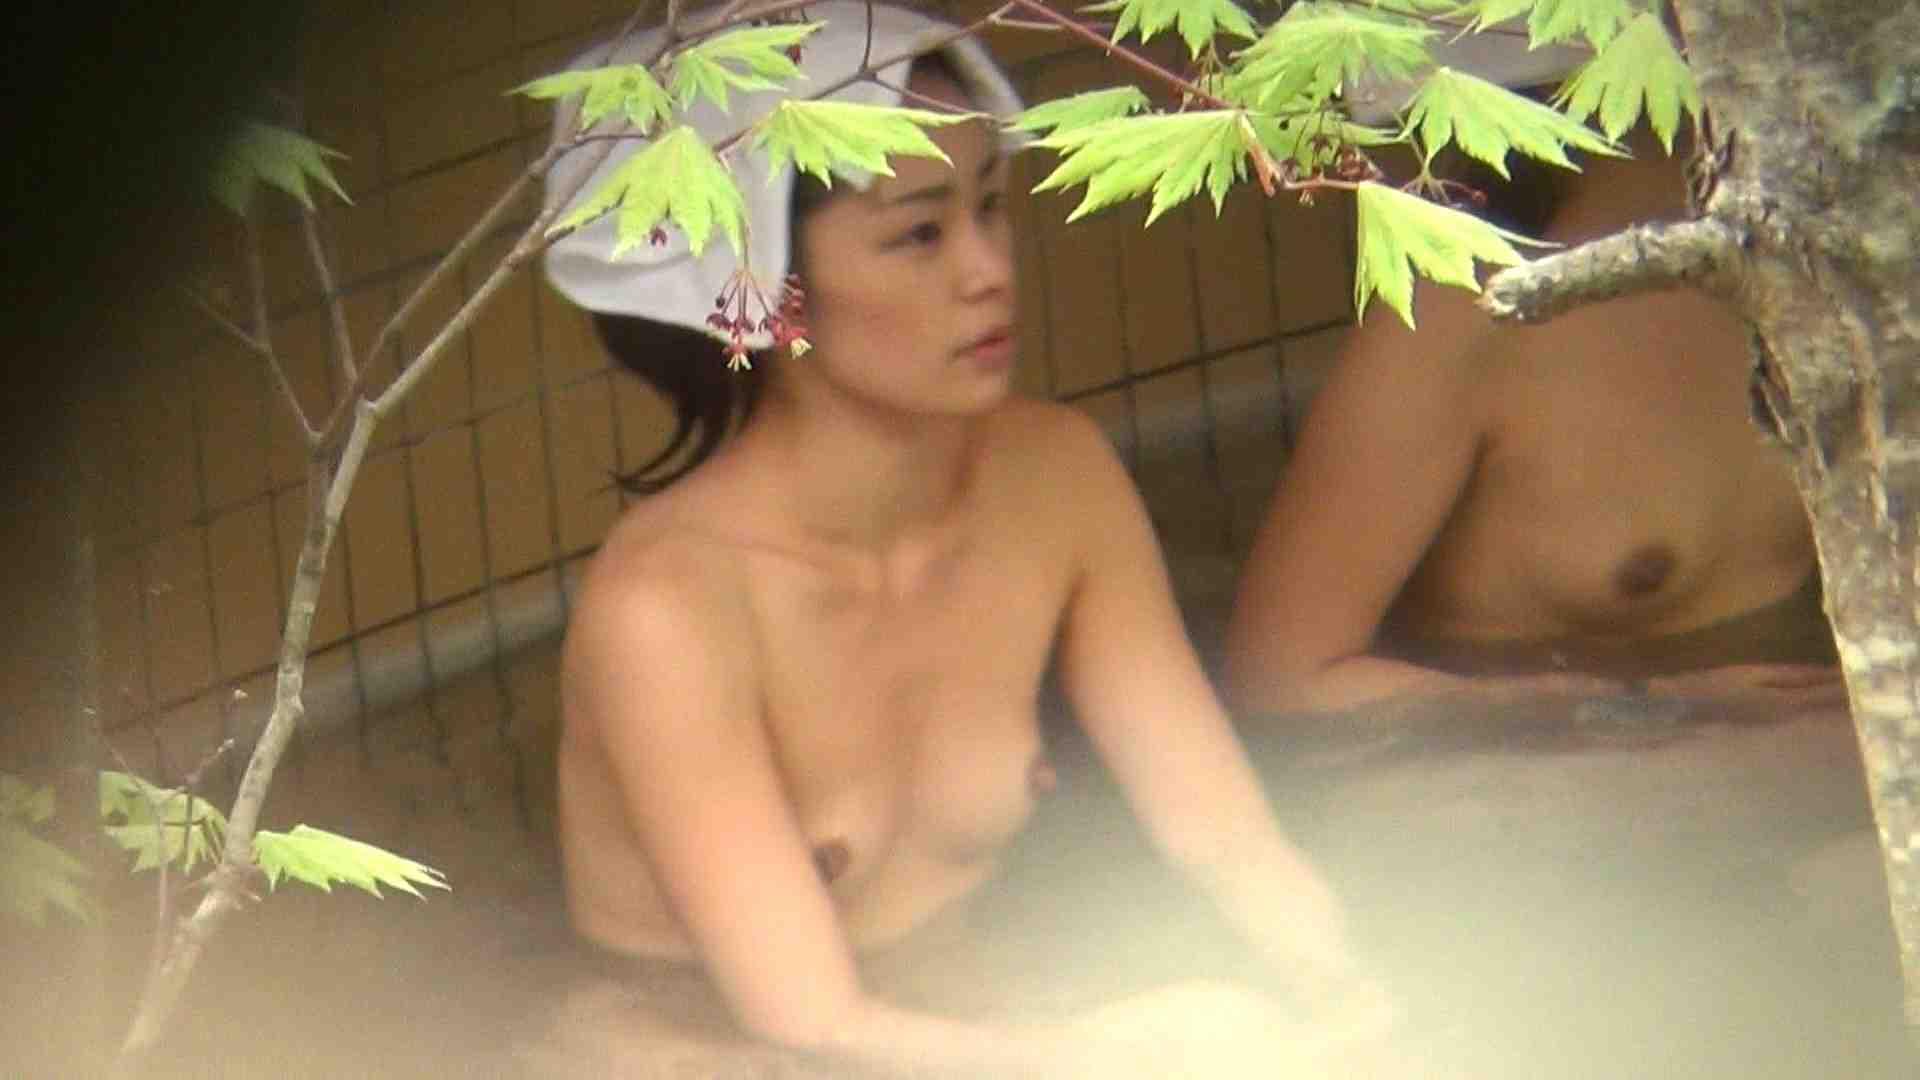 Aquaな露天風呂Vol.232 盗撮 | HなOL  81pic 80